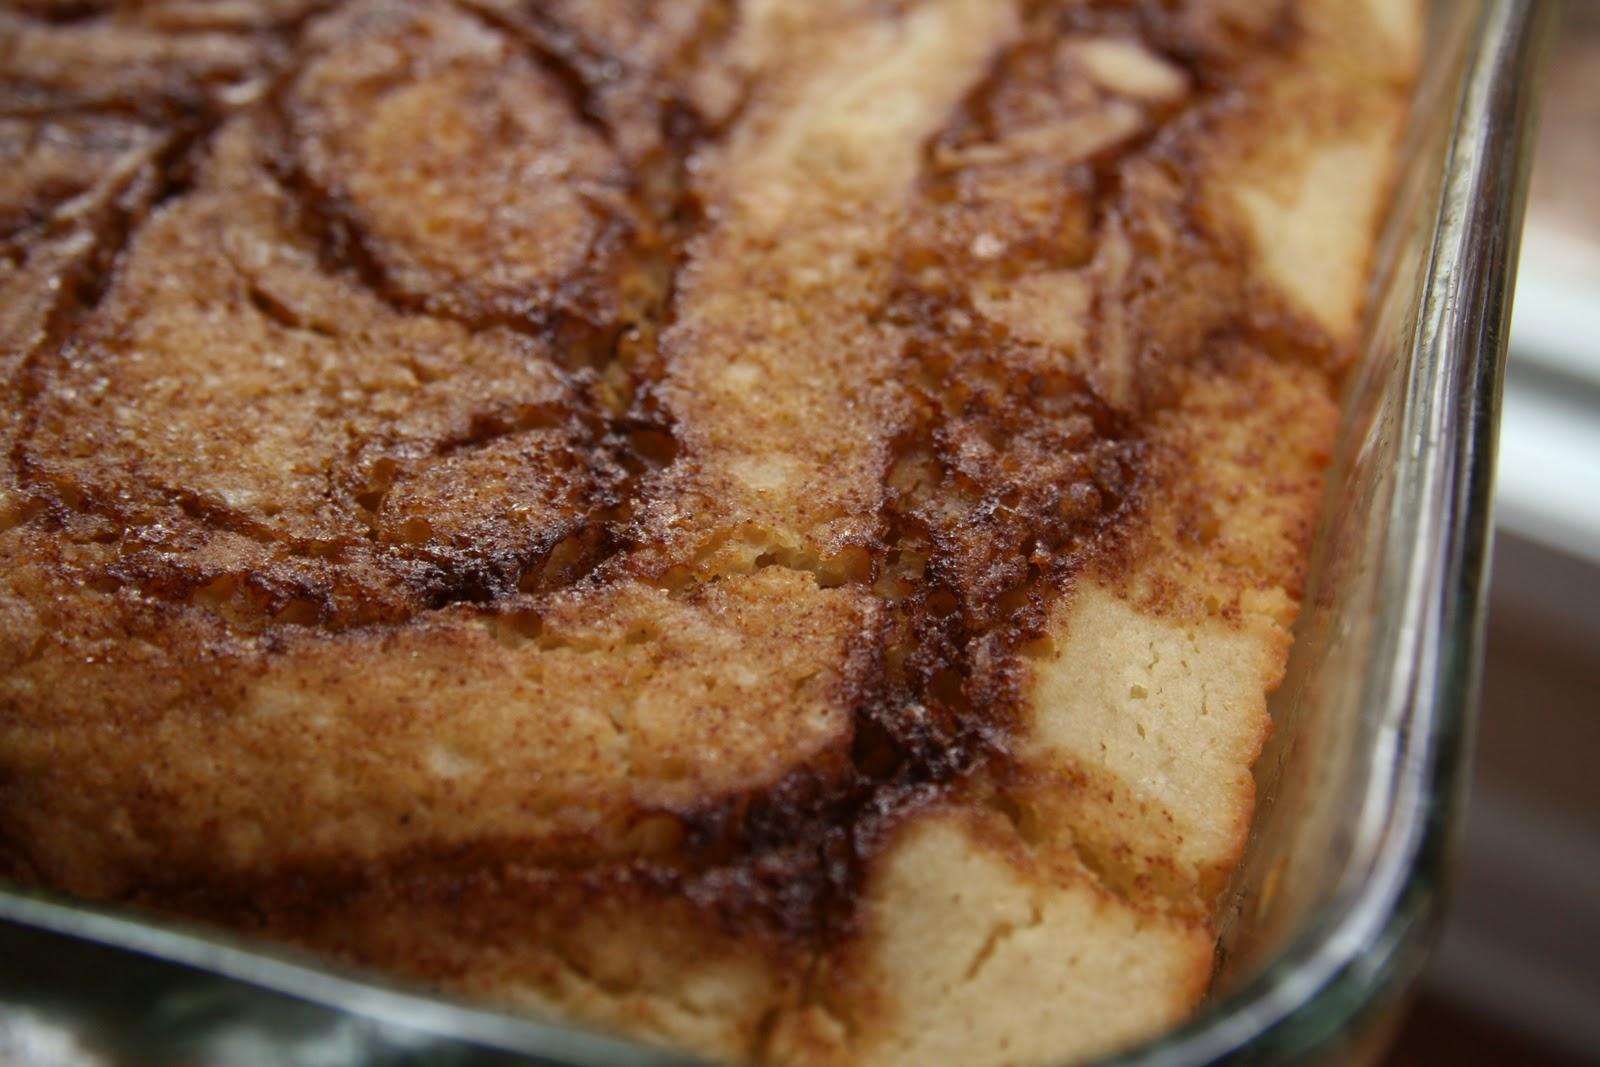 Cinnamon Bun Bread (Gluten Free/Dairy Free/Egg Free)